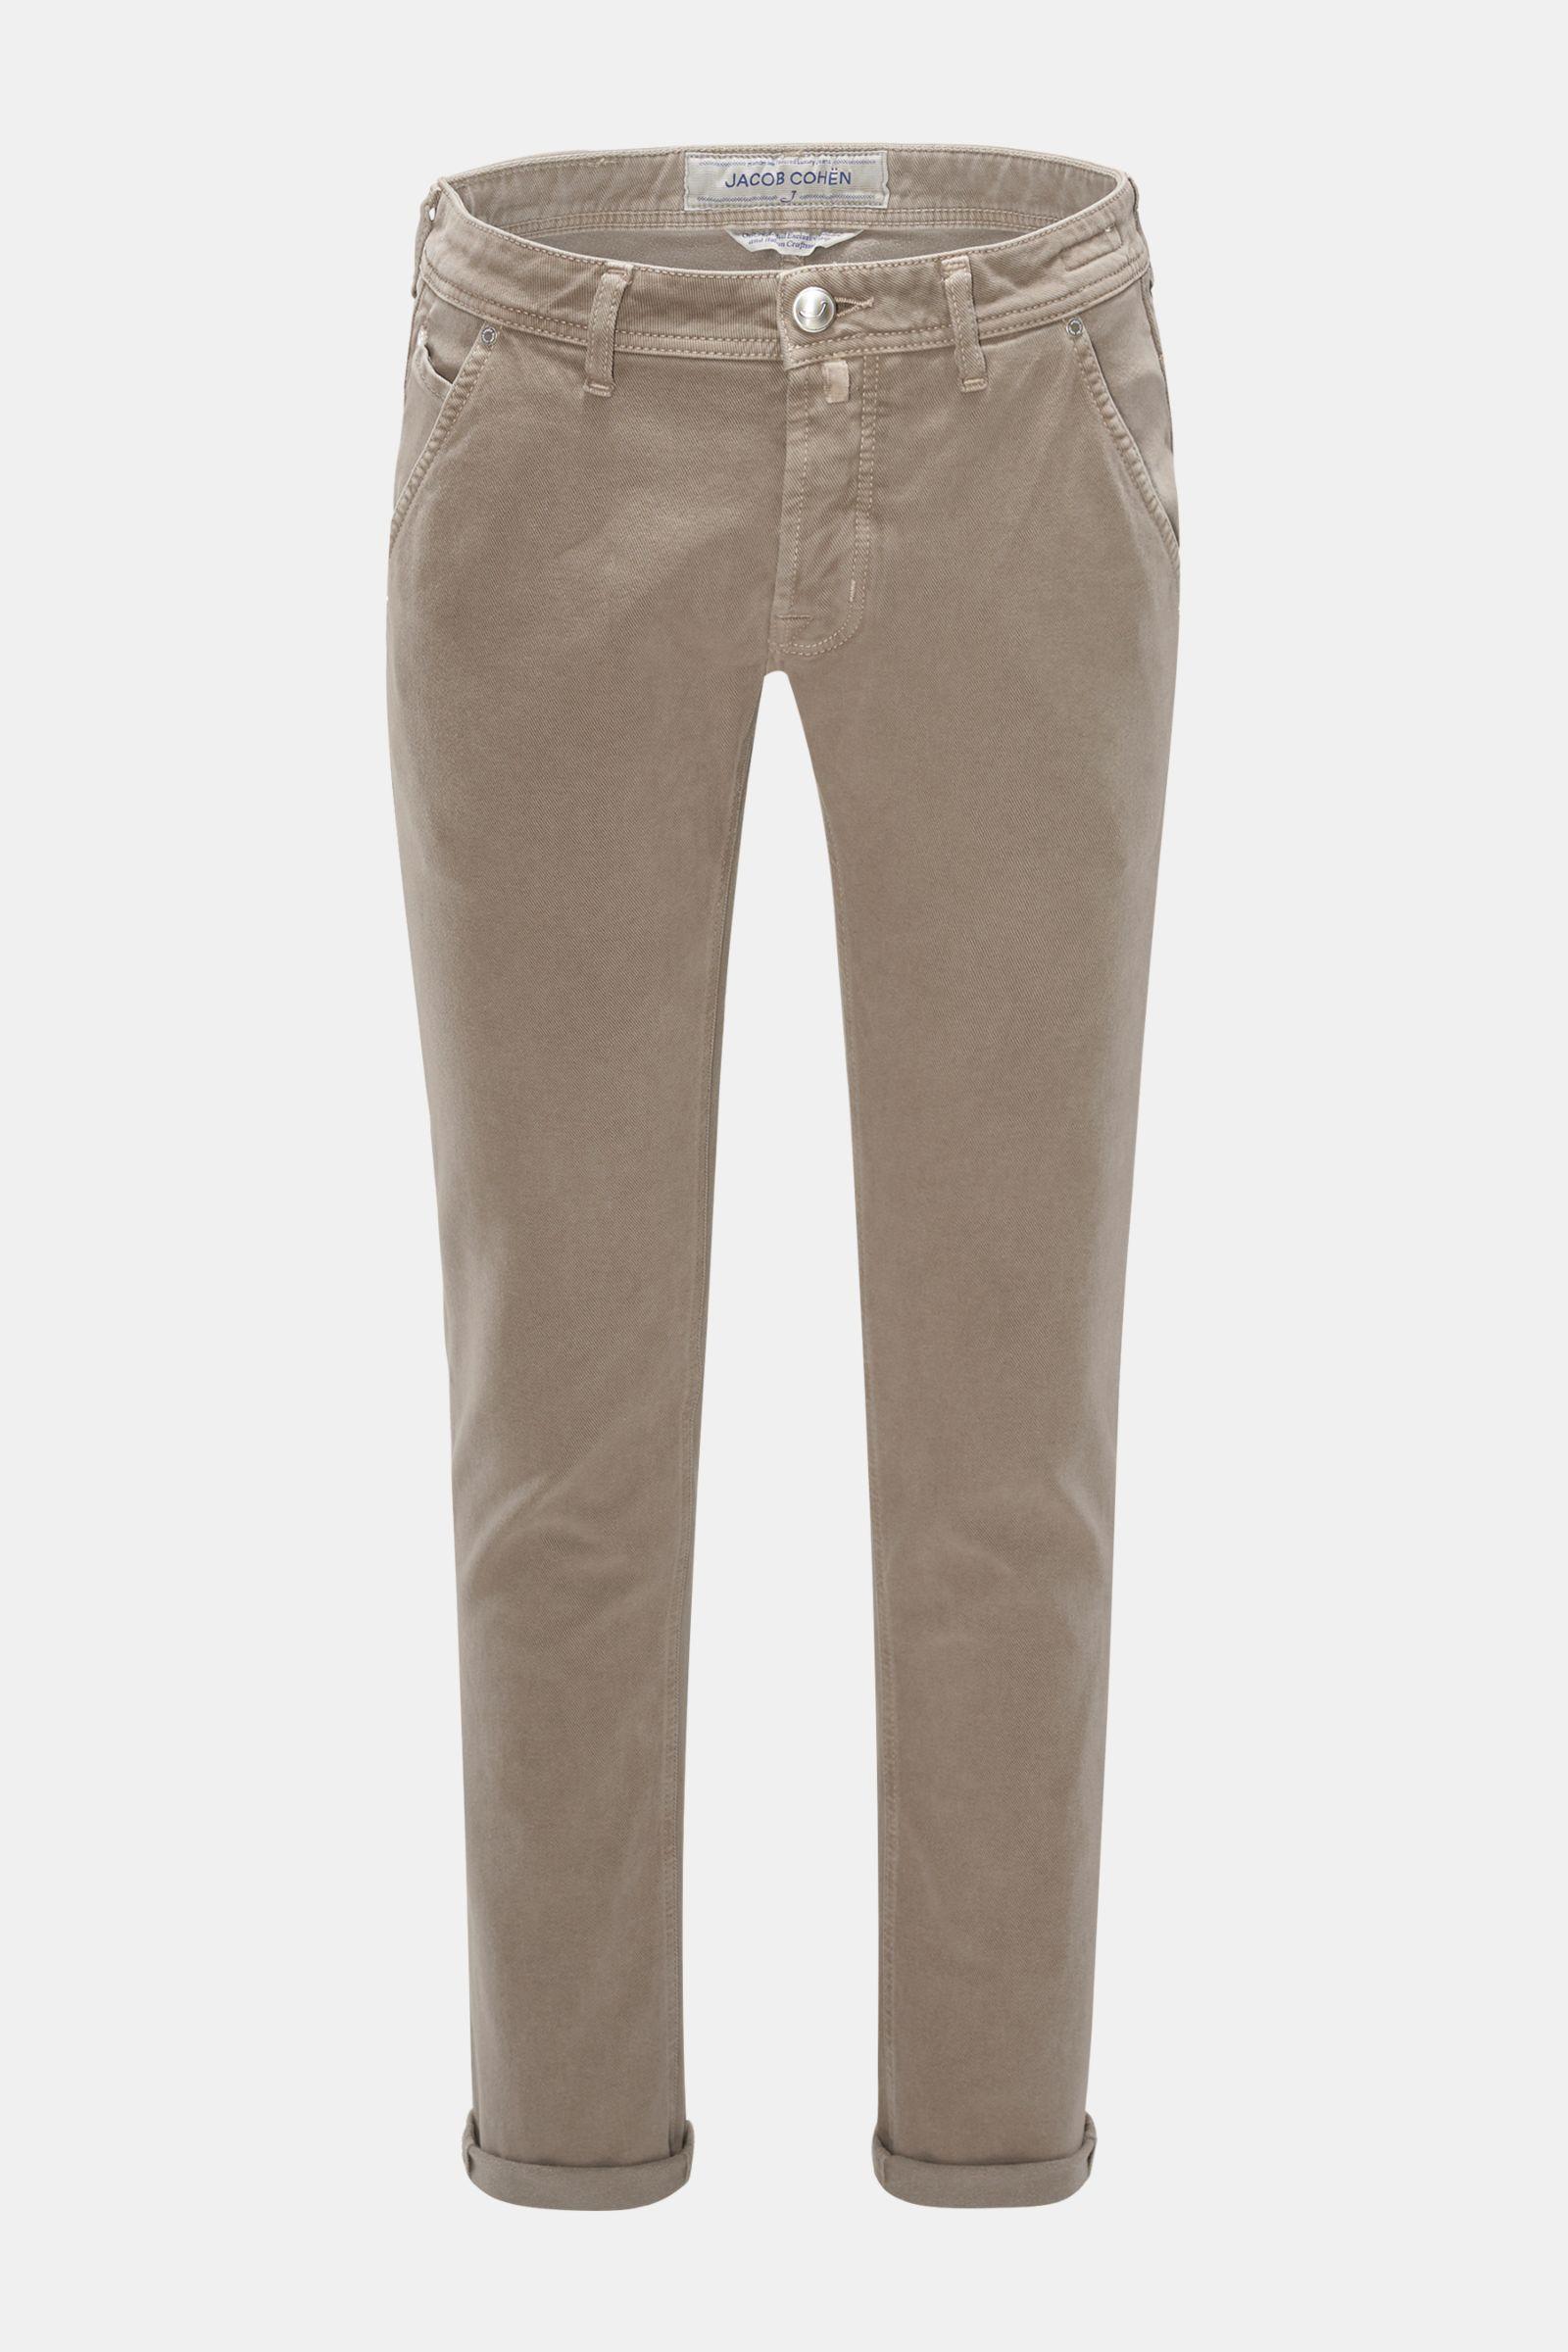 Baumwollhose 'J613 Comfort Vintage Slim Fit' graubraun